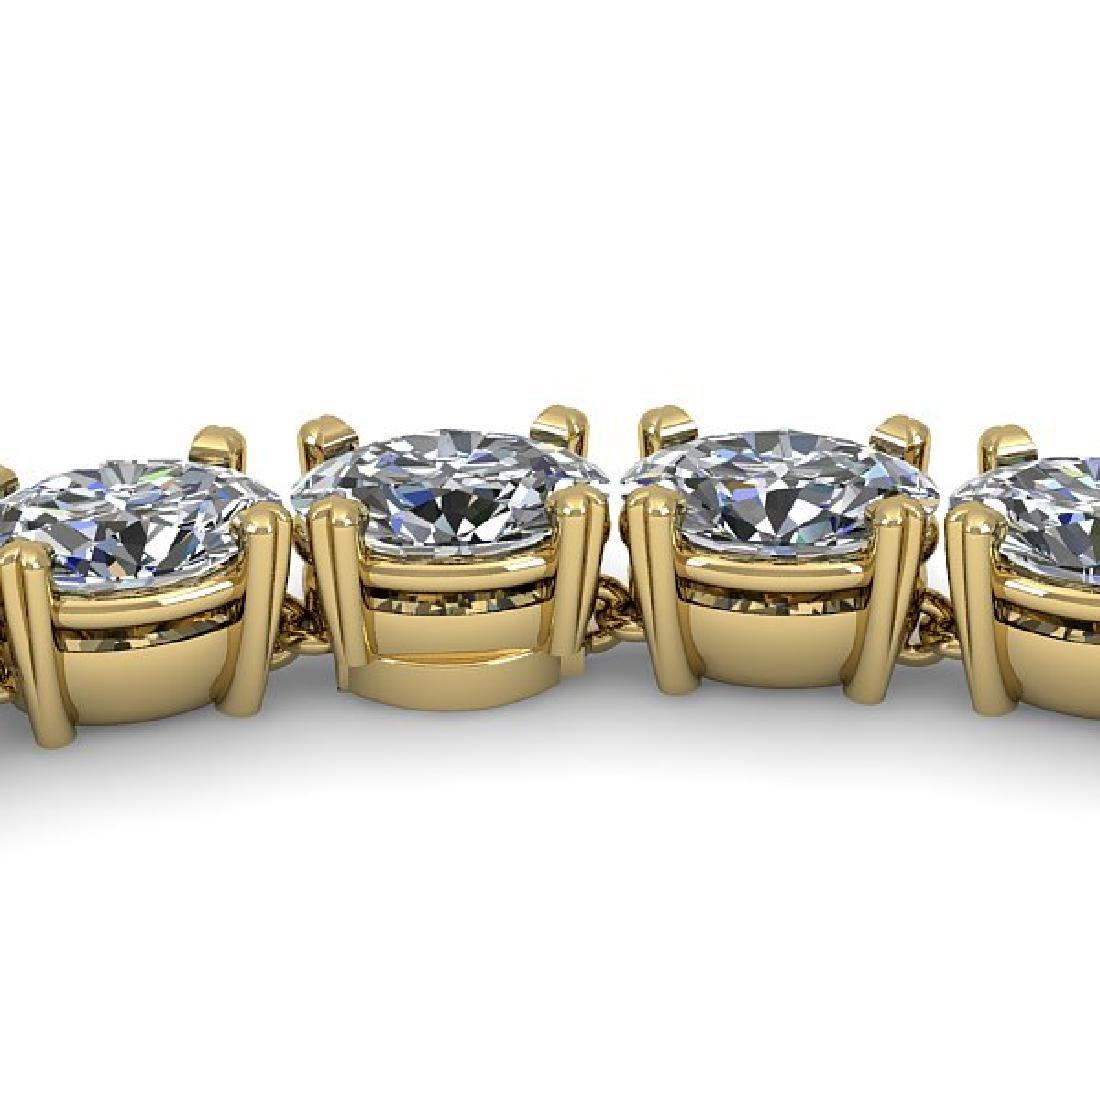 35 CTW Oval Cut Certified SI Diamond Necklace 18K